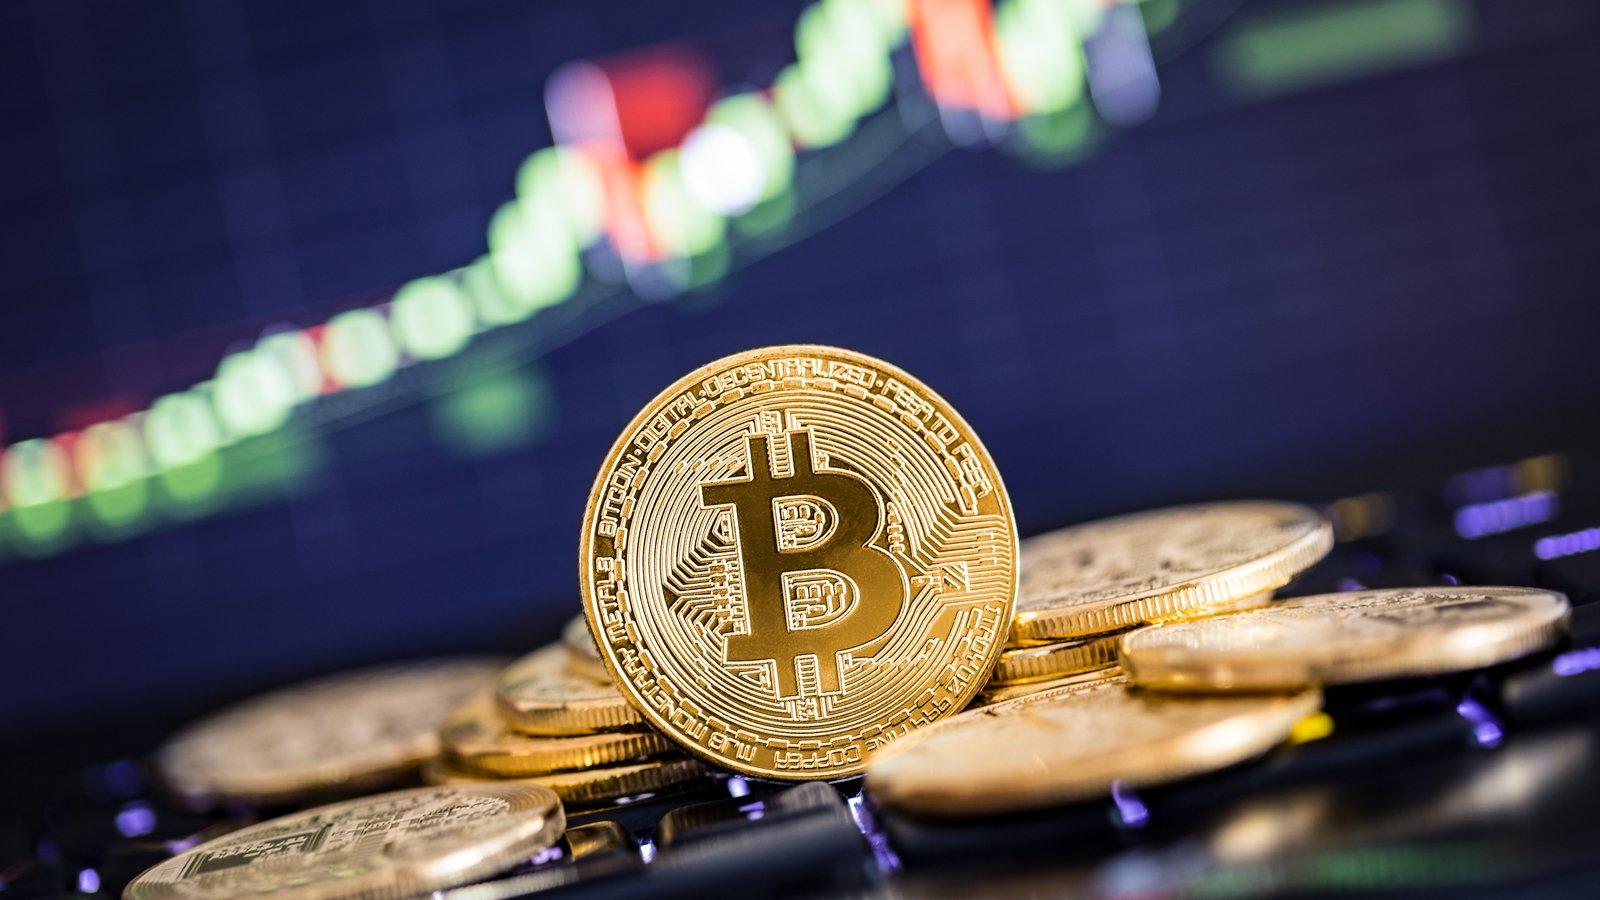 Bitcoin Cryptocurrency Terbaik, tetapi Ada Yang Aman Membeli Blockchain